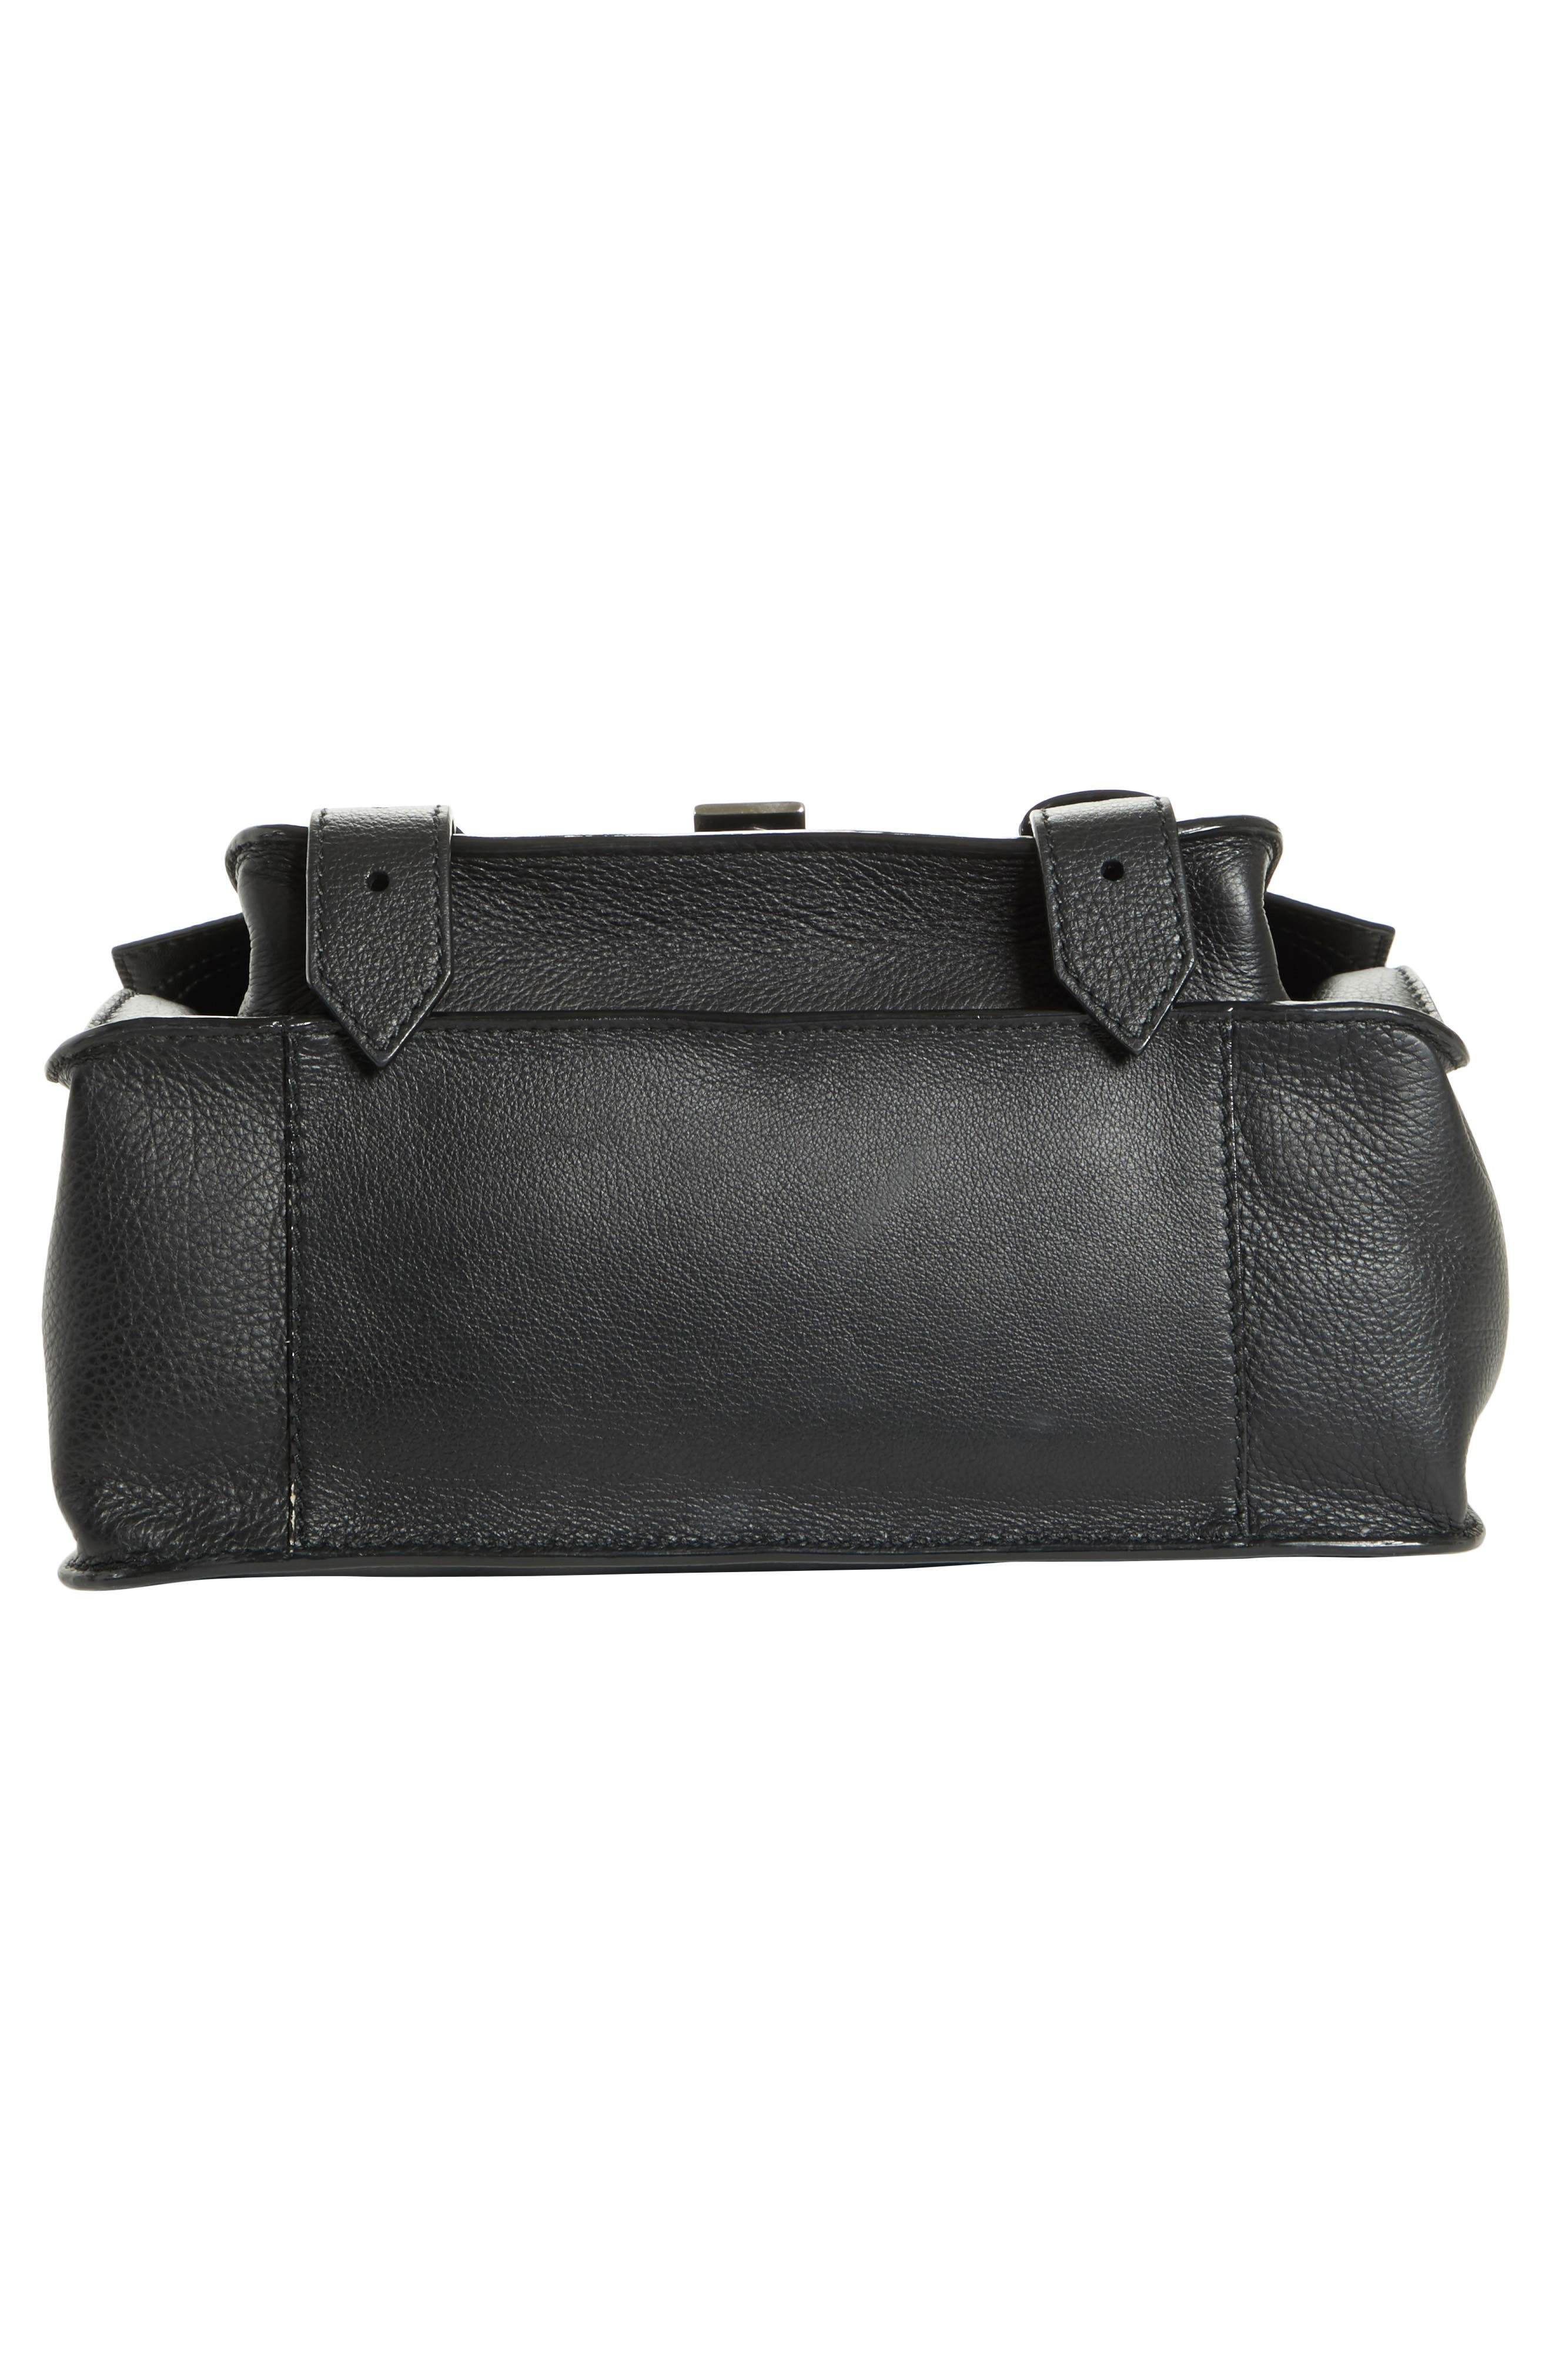 Tiny PS1 Grainy Leather Satchel,                             Alternate thumbnail 5, color,                             BLACK